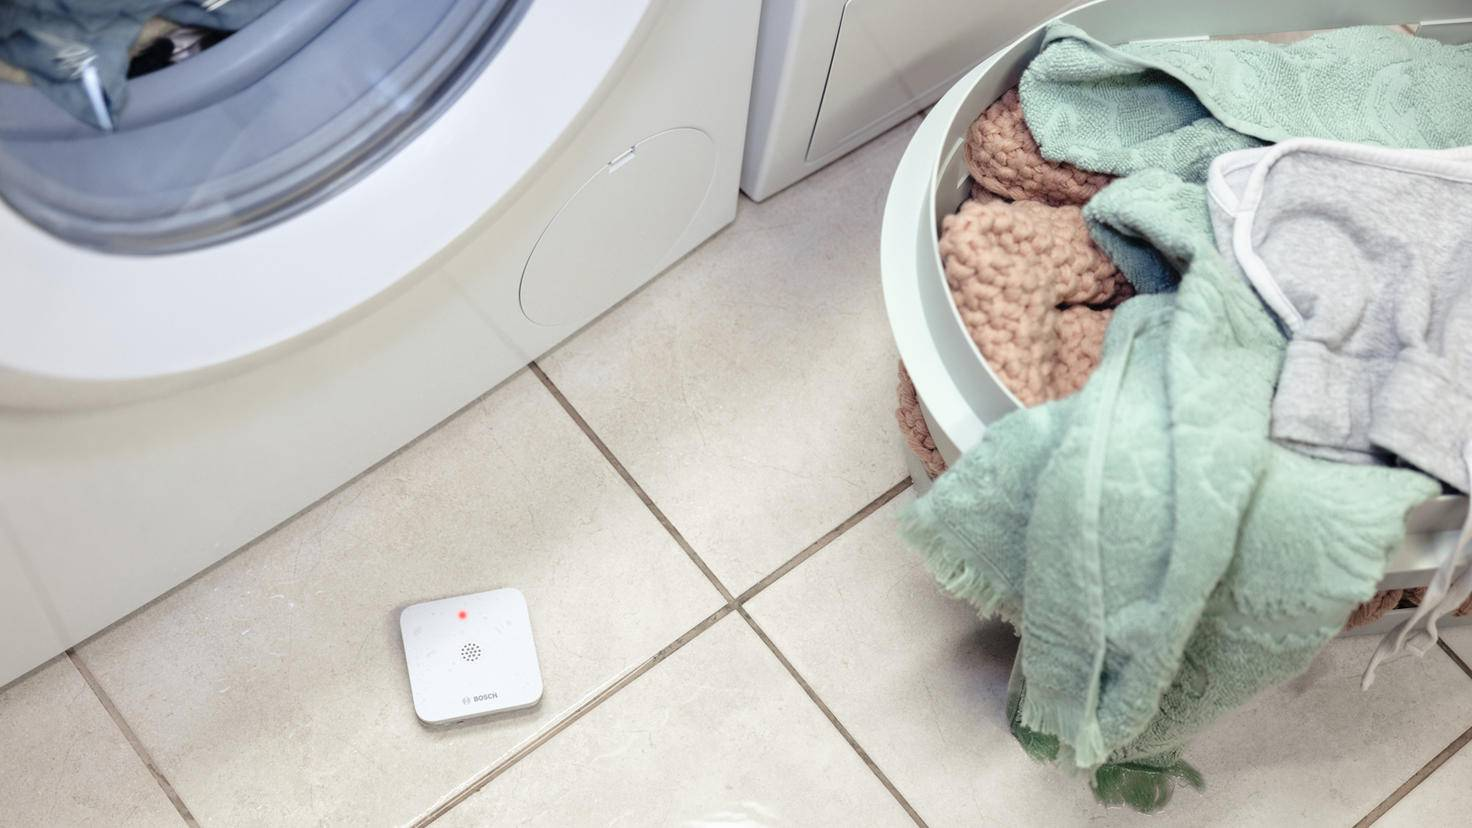 bosch smart home wassermelder